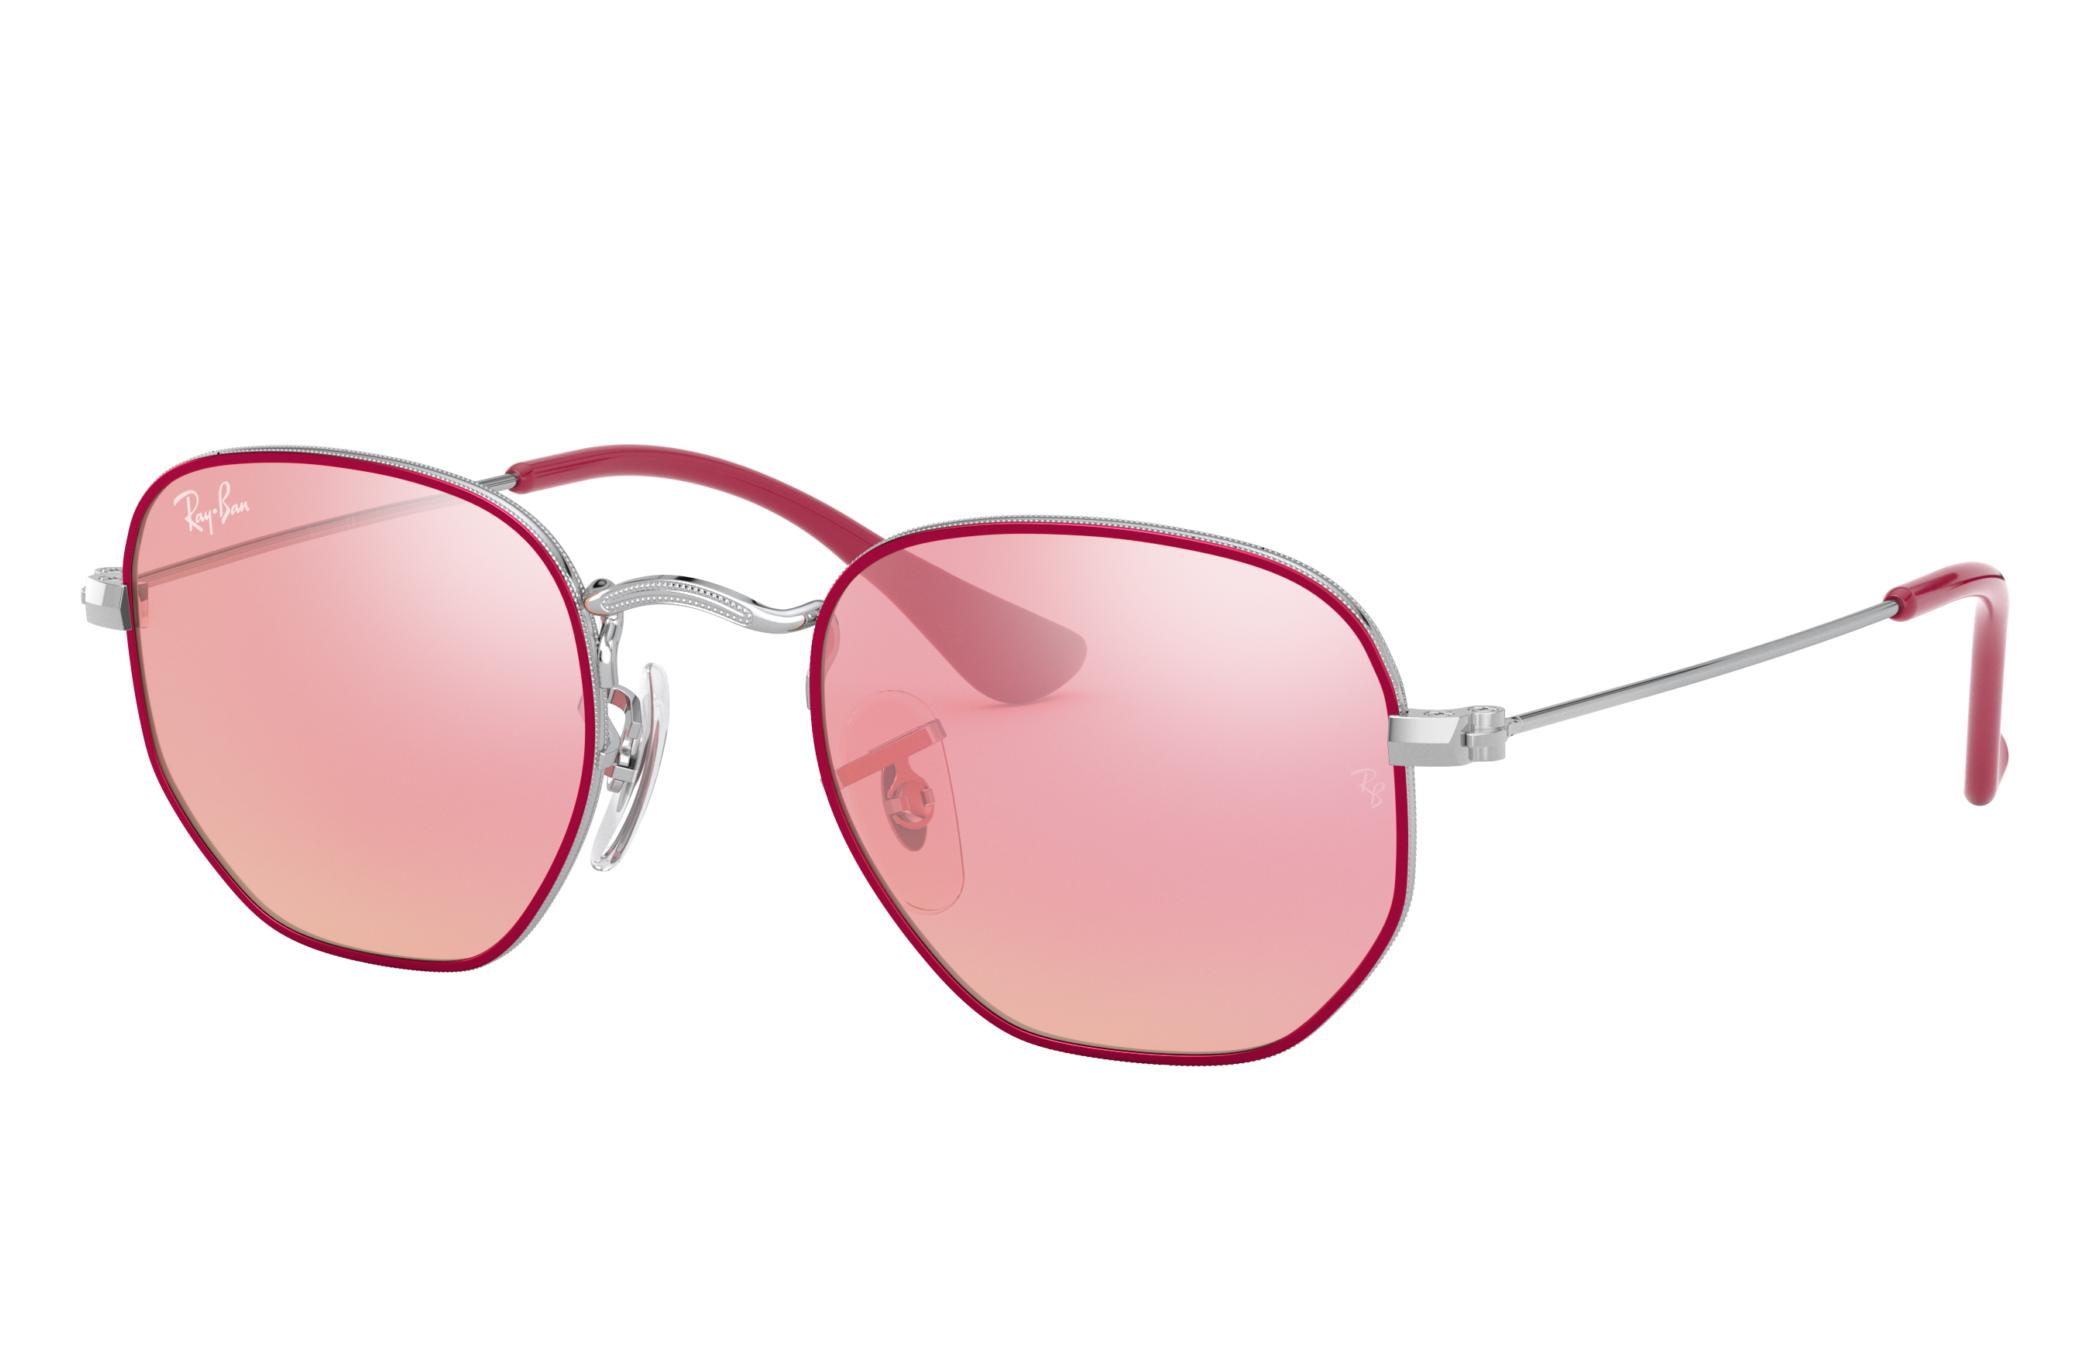 Ray-Ban Hexagonal Junior Silver, Pink Lenses - RJ9541SN